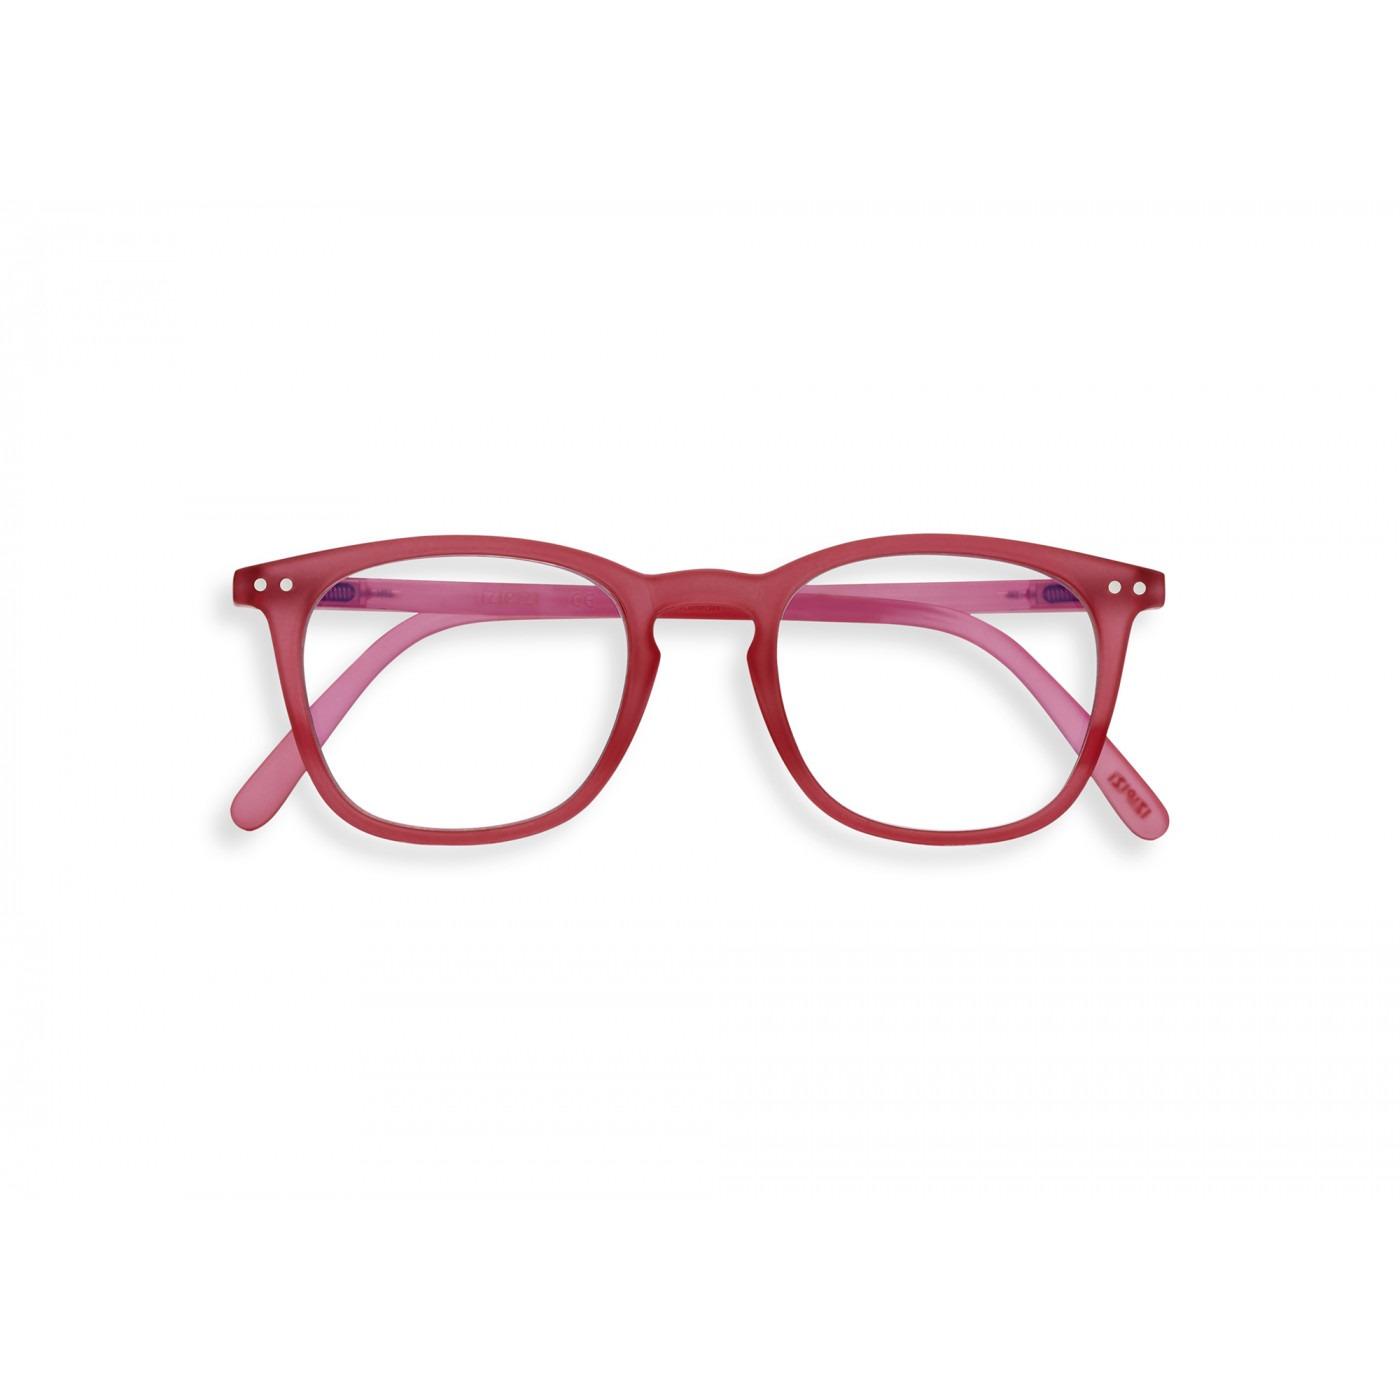 Izipizi #E Screen Protection Glasses in Sunset Pink